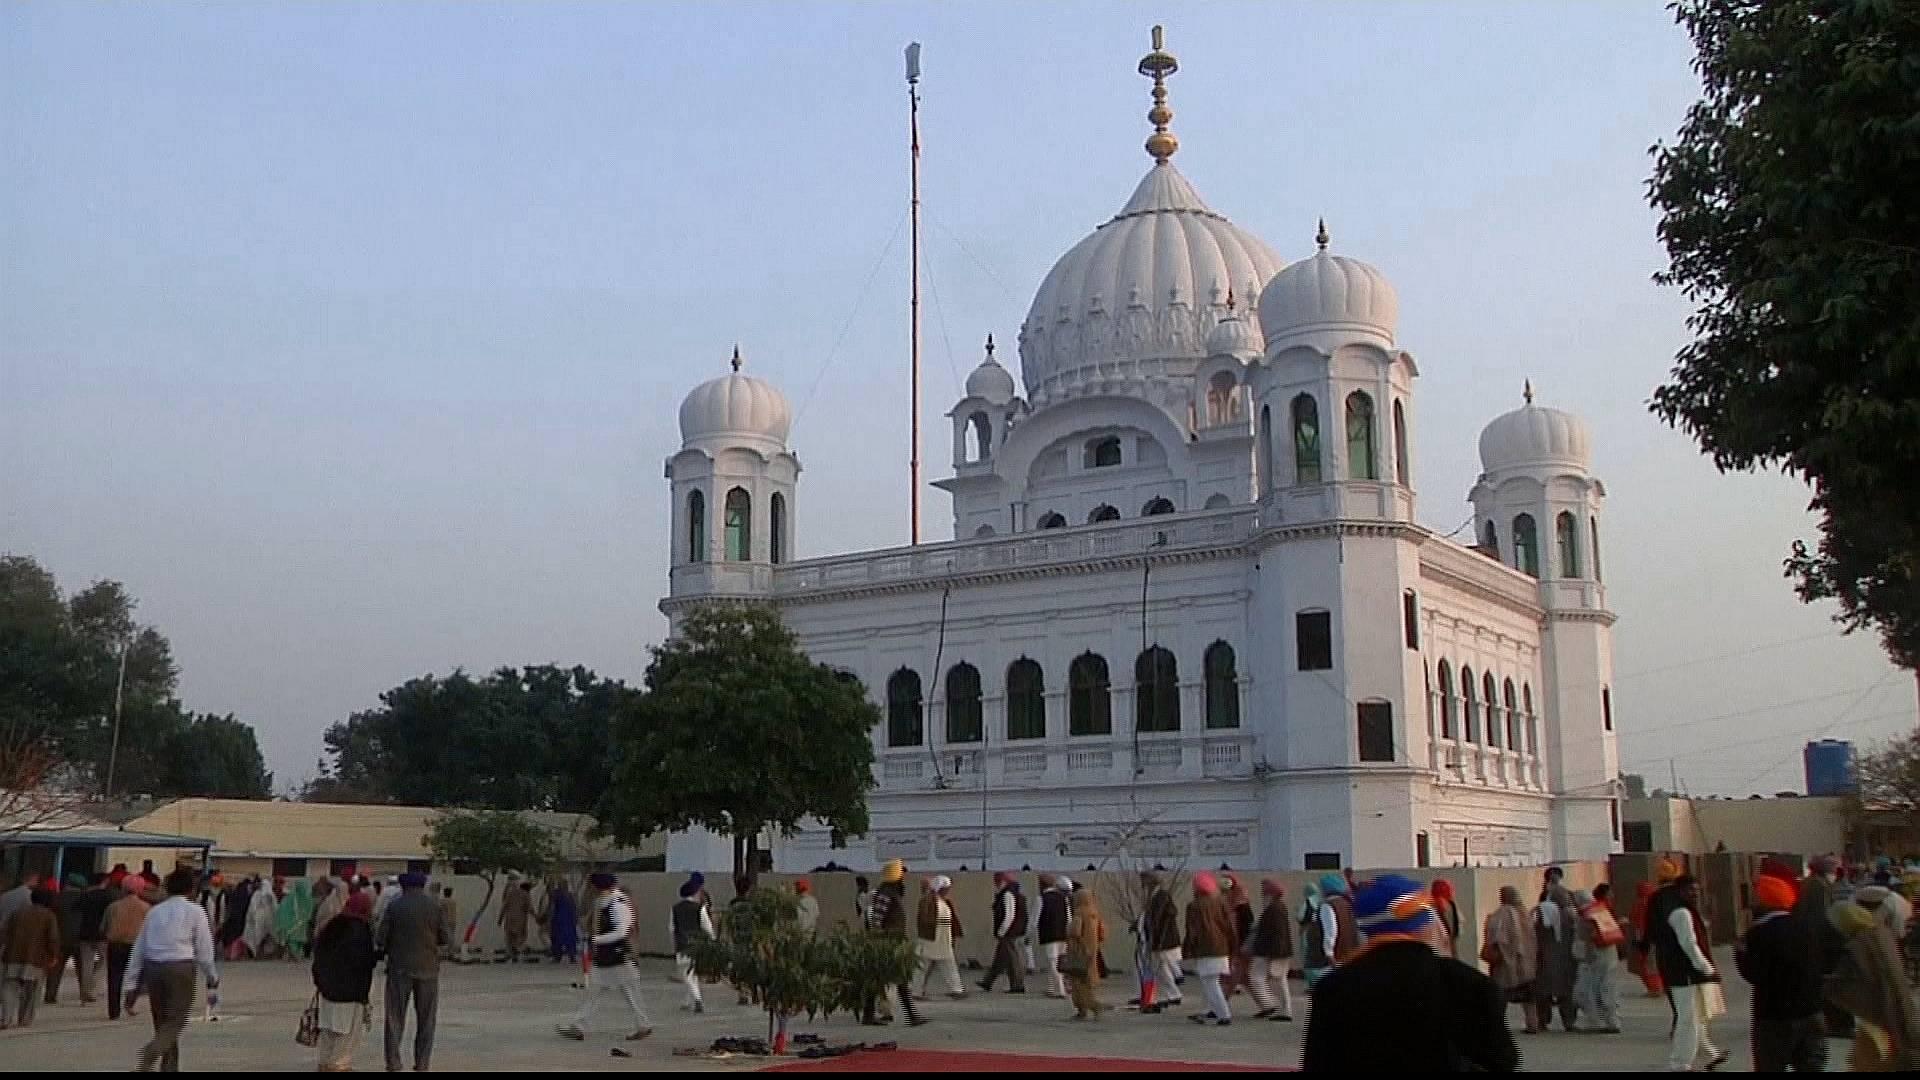 Punjab set to witness history with Kartarpur Corridor opening